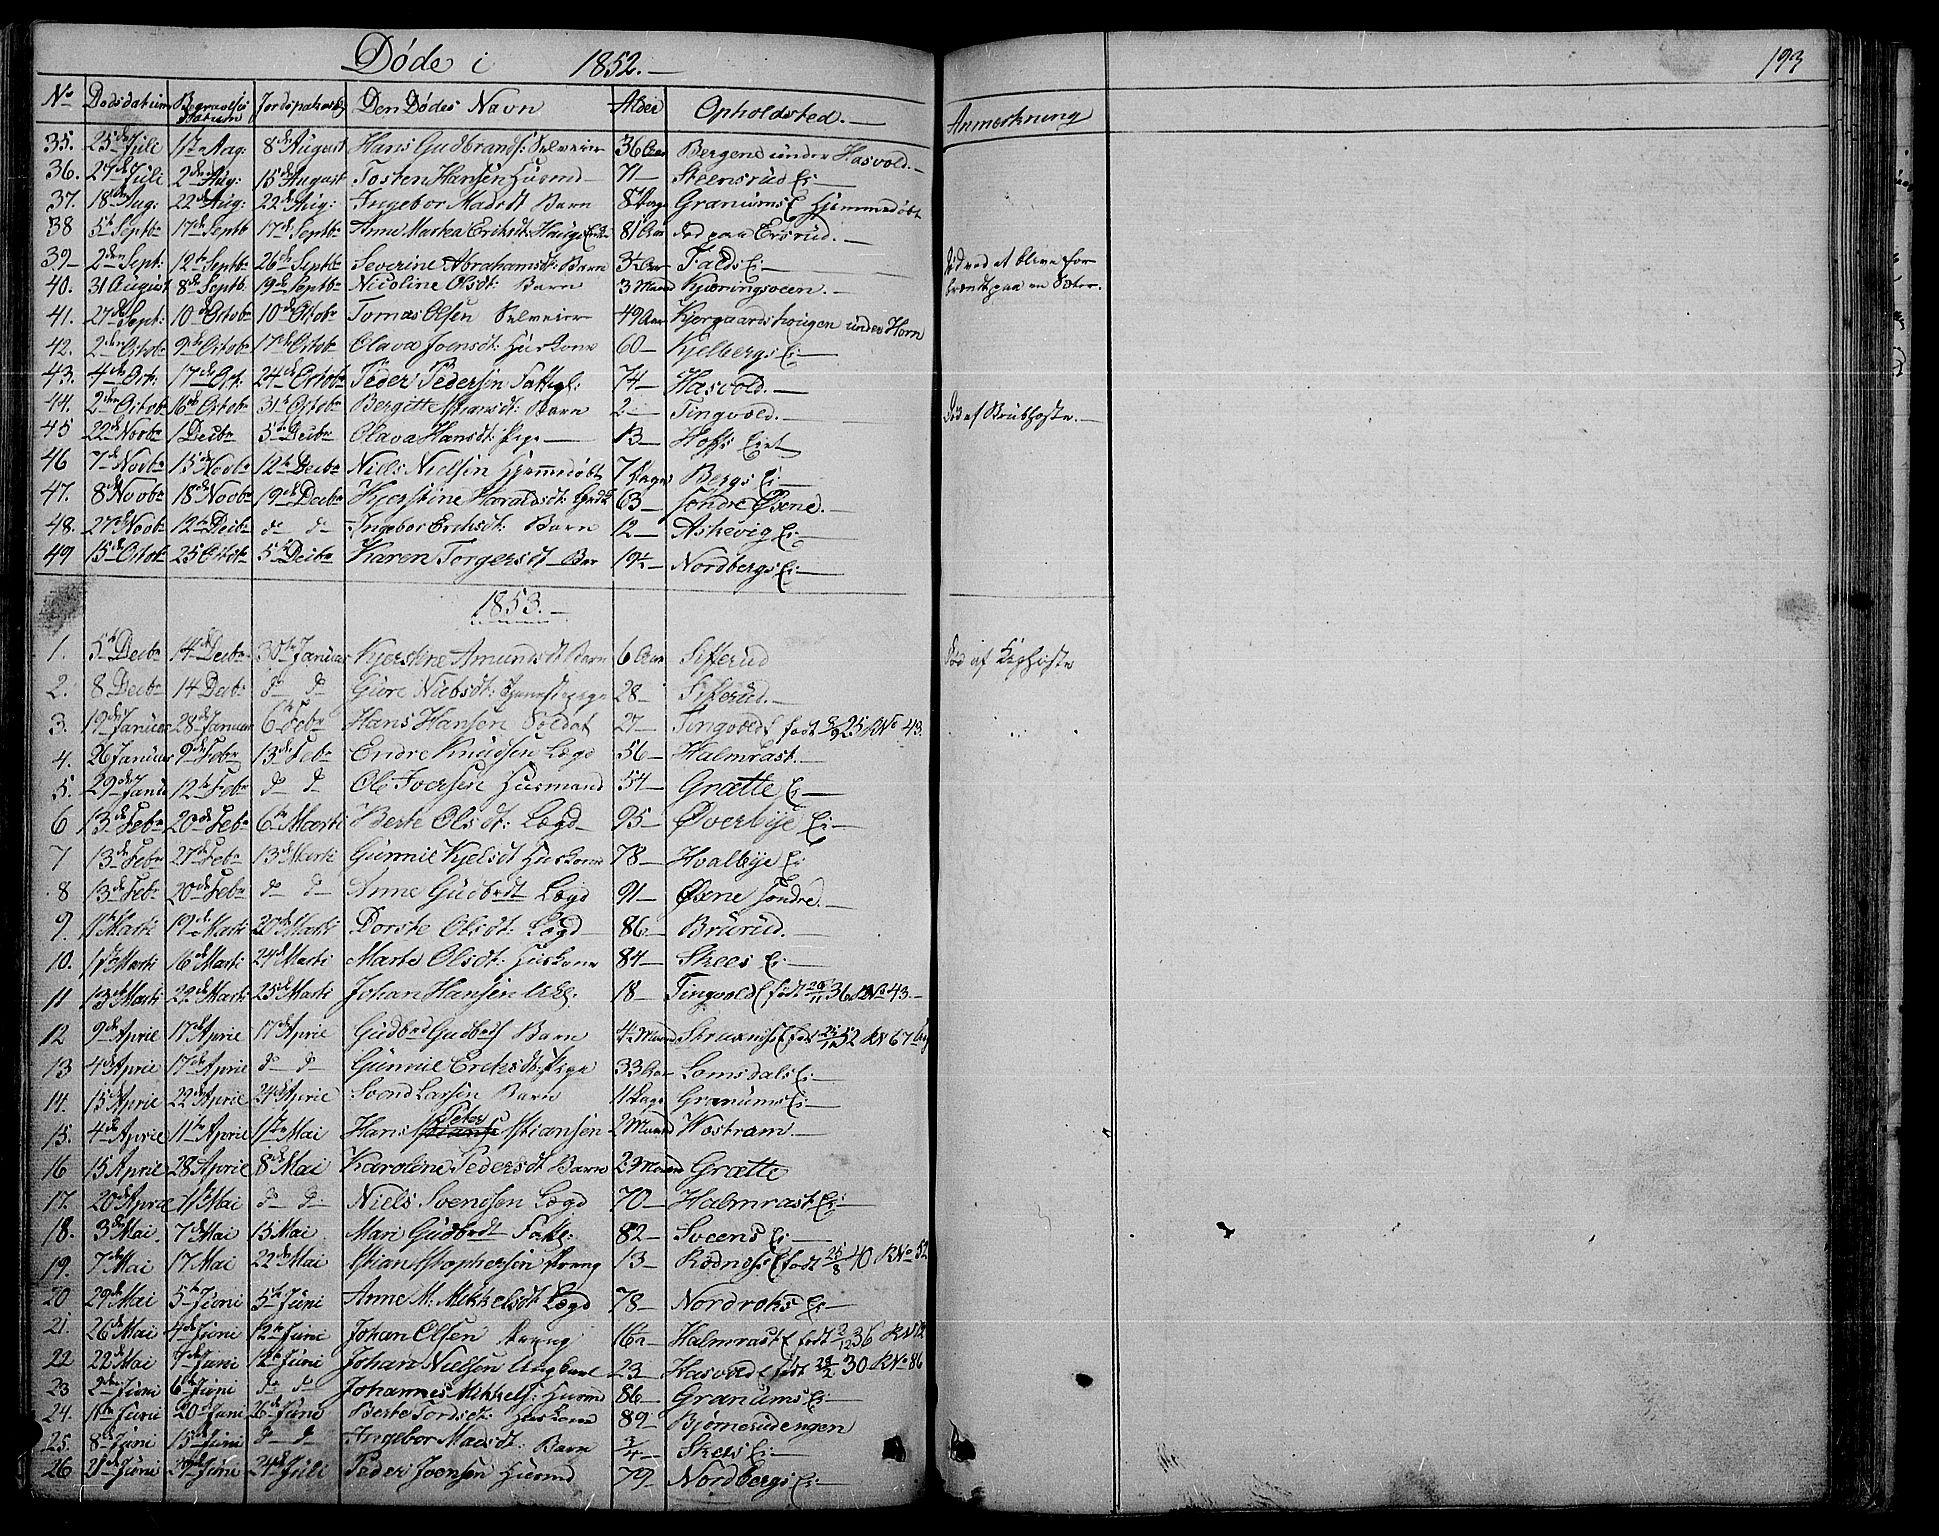 SAH, Søndre Land prestekontor, L/L0001: Klokkerbok nr. 1, 1849-1883, s. 193